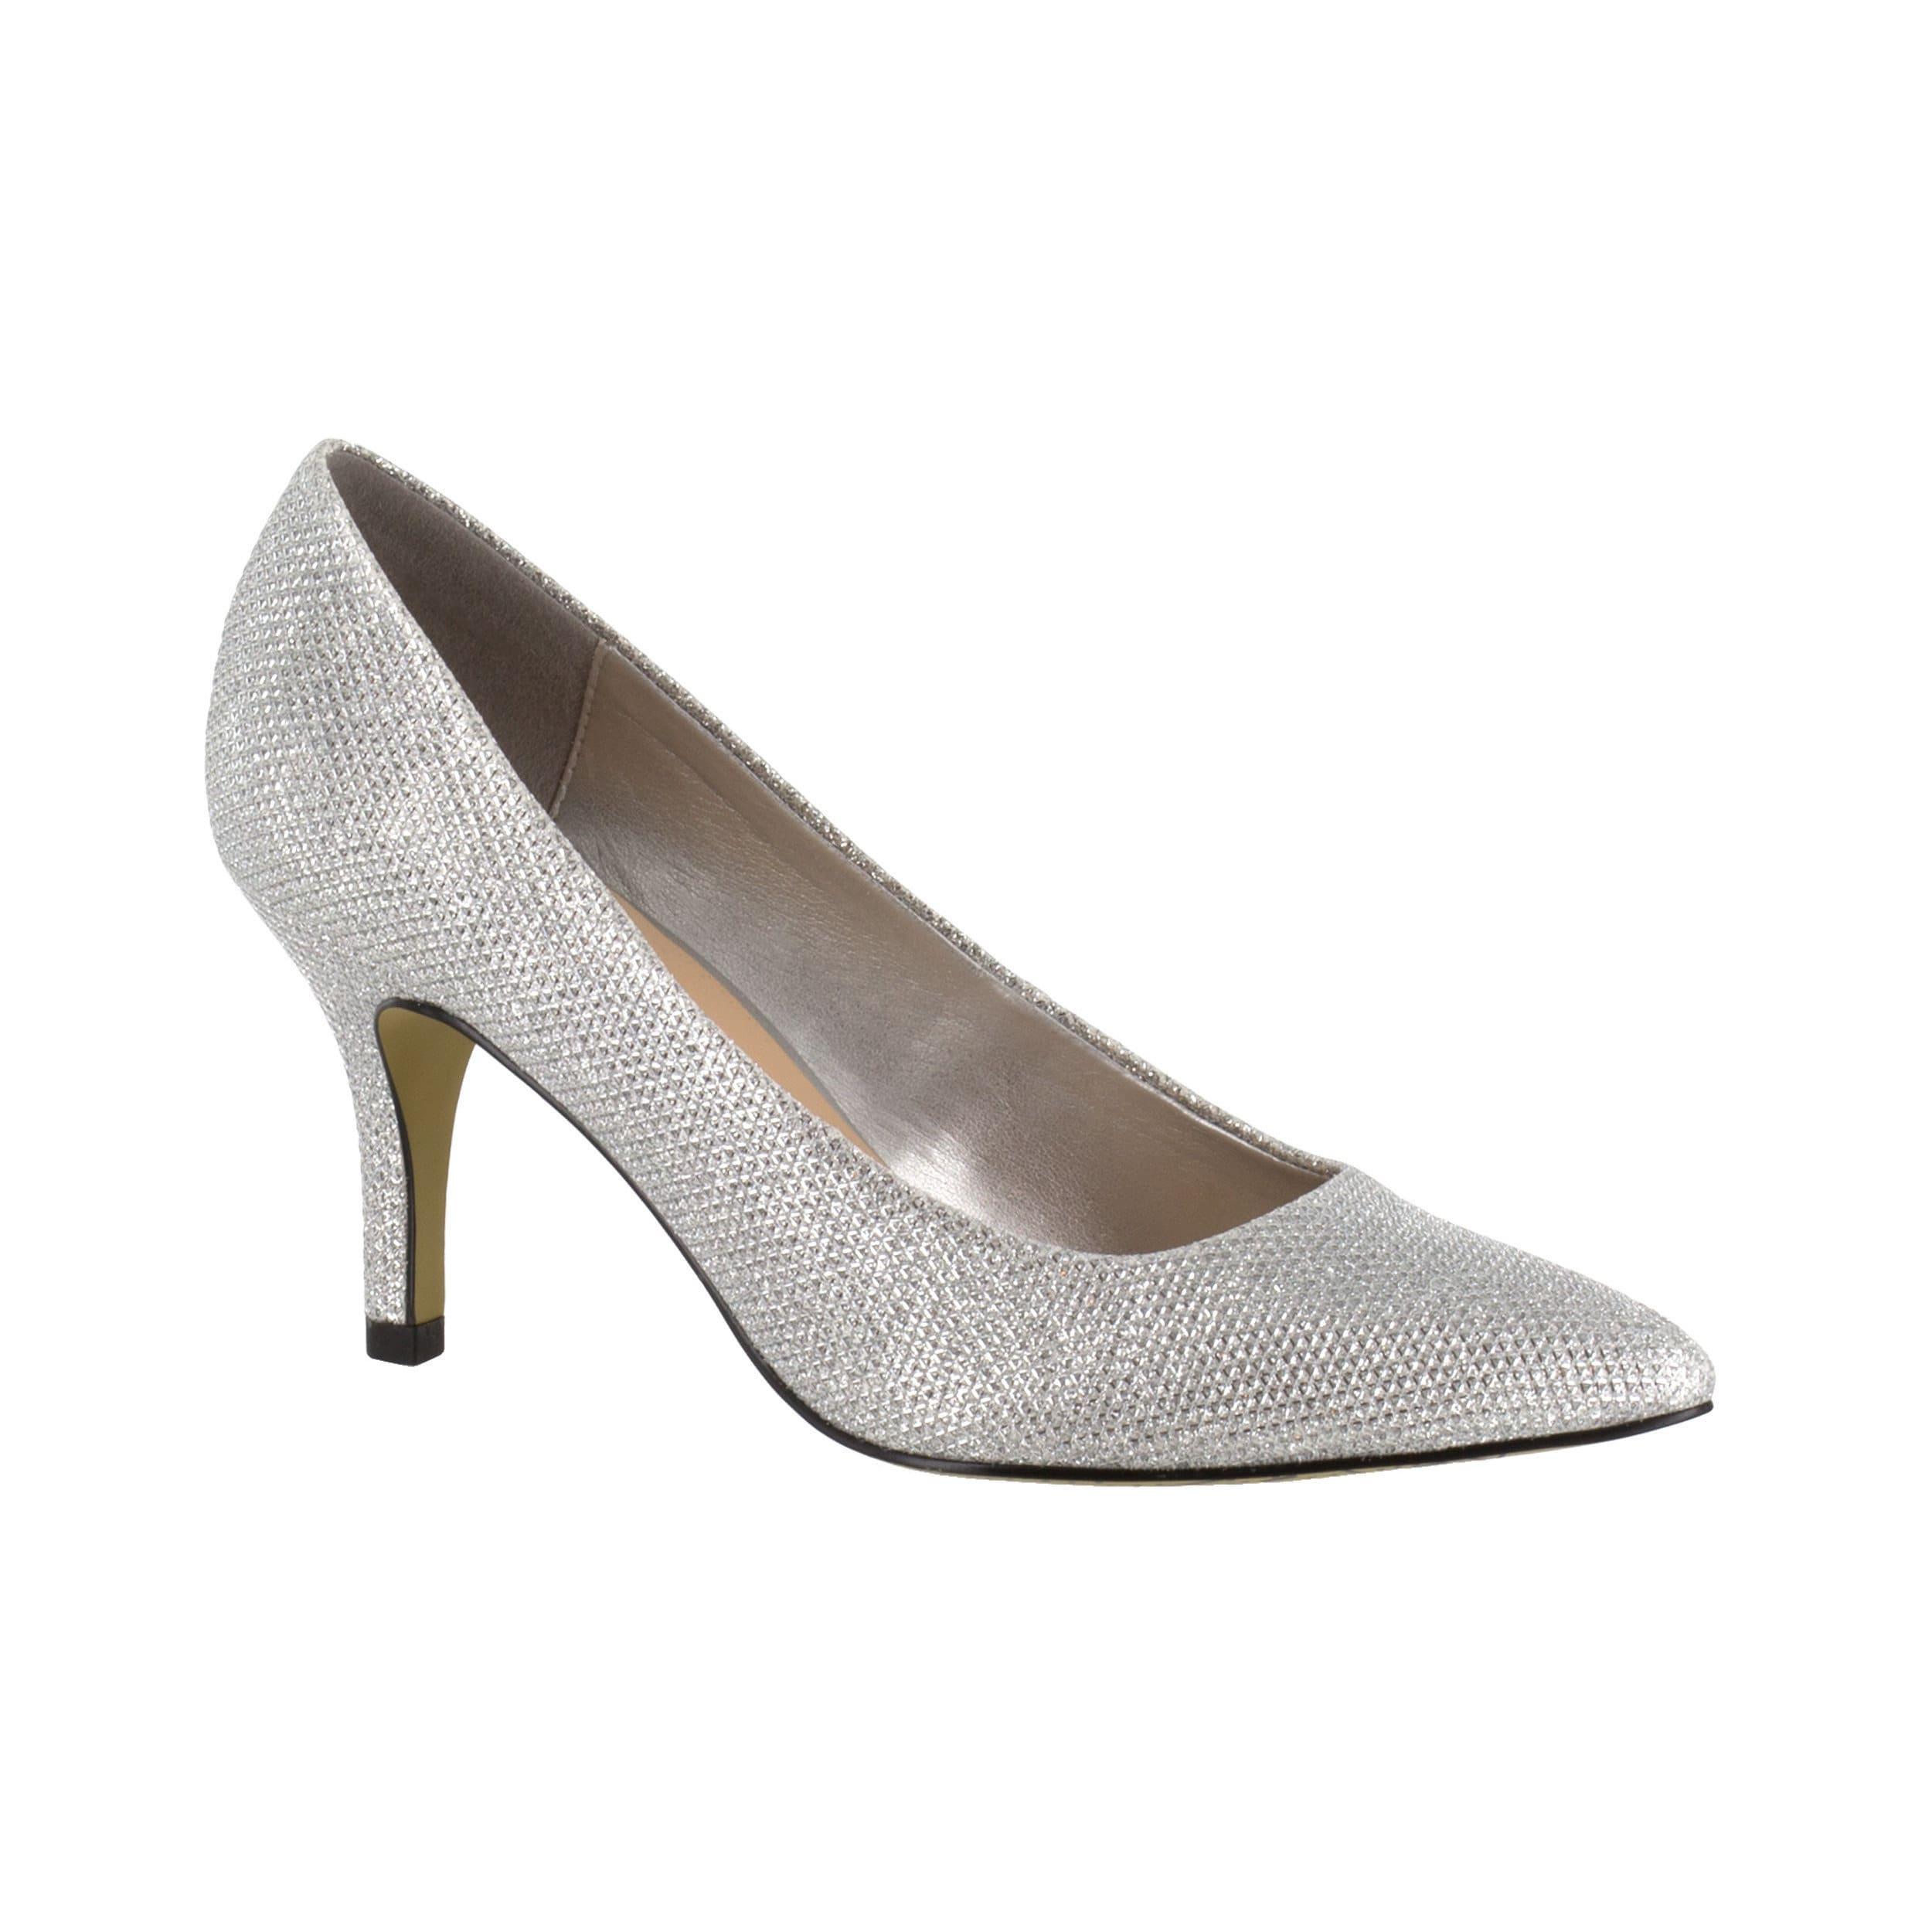 Bella Vita Define Ii Pumps Women's Shoes